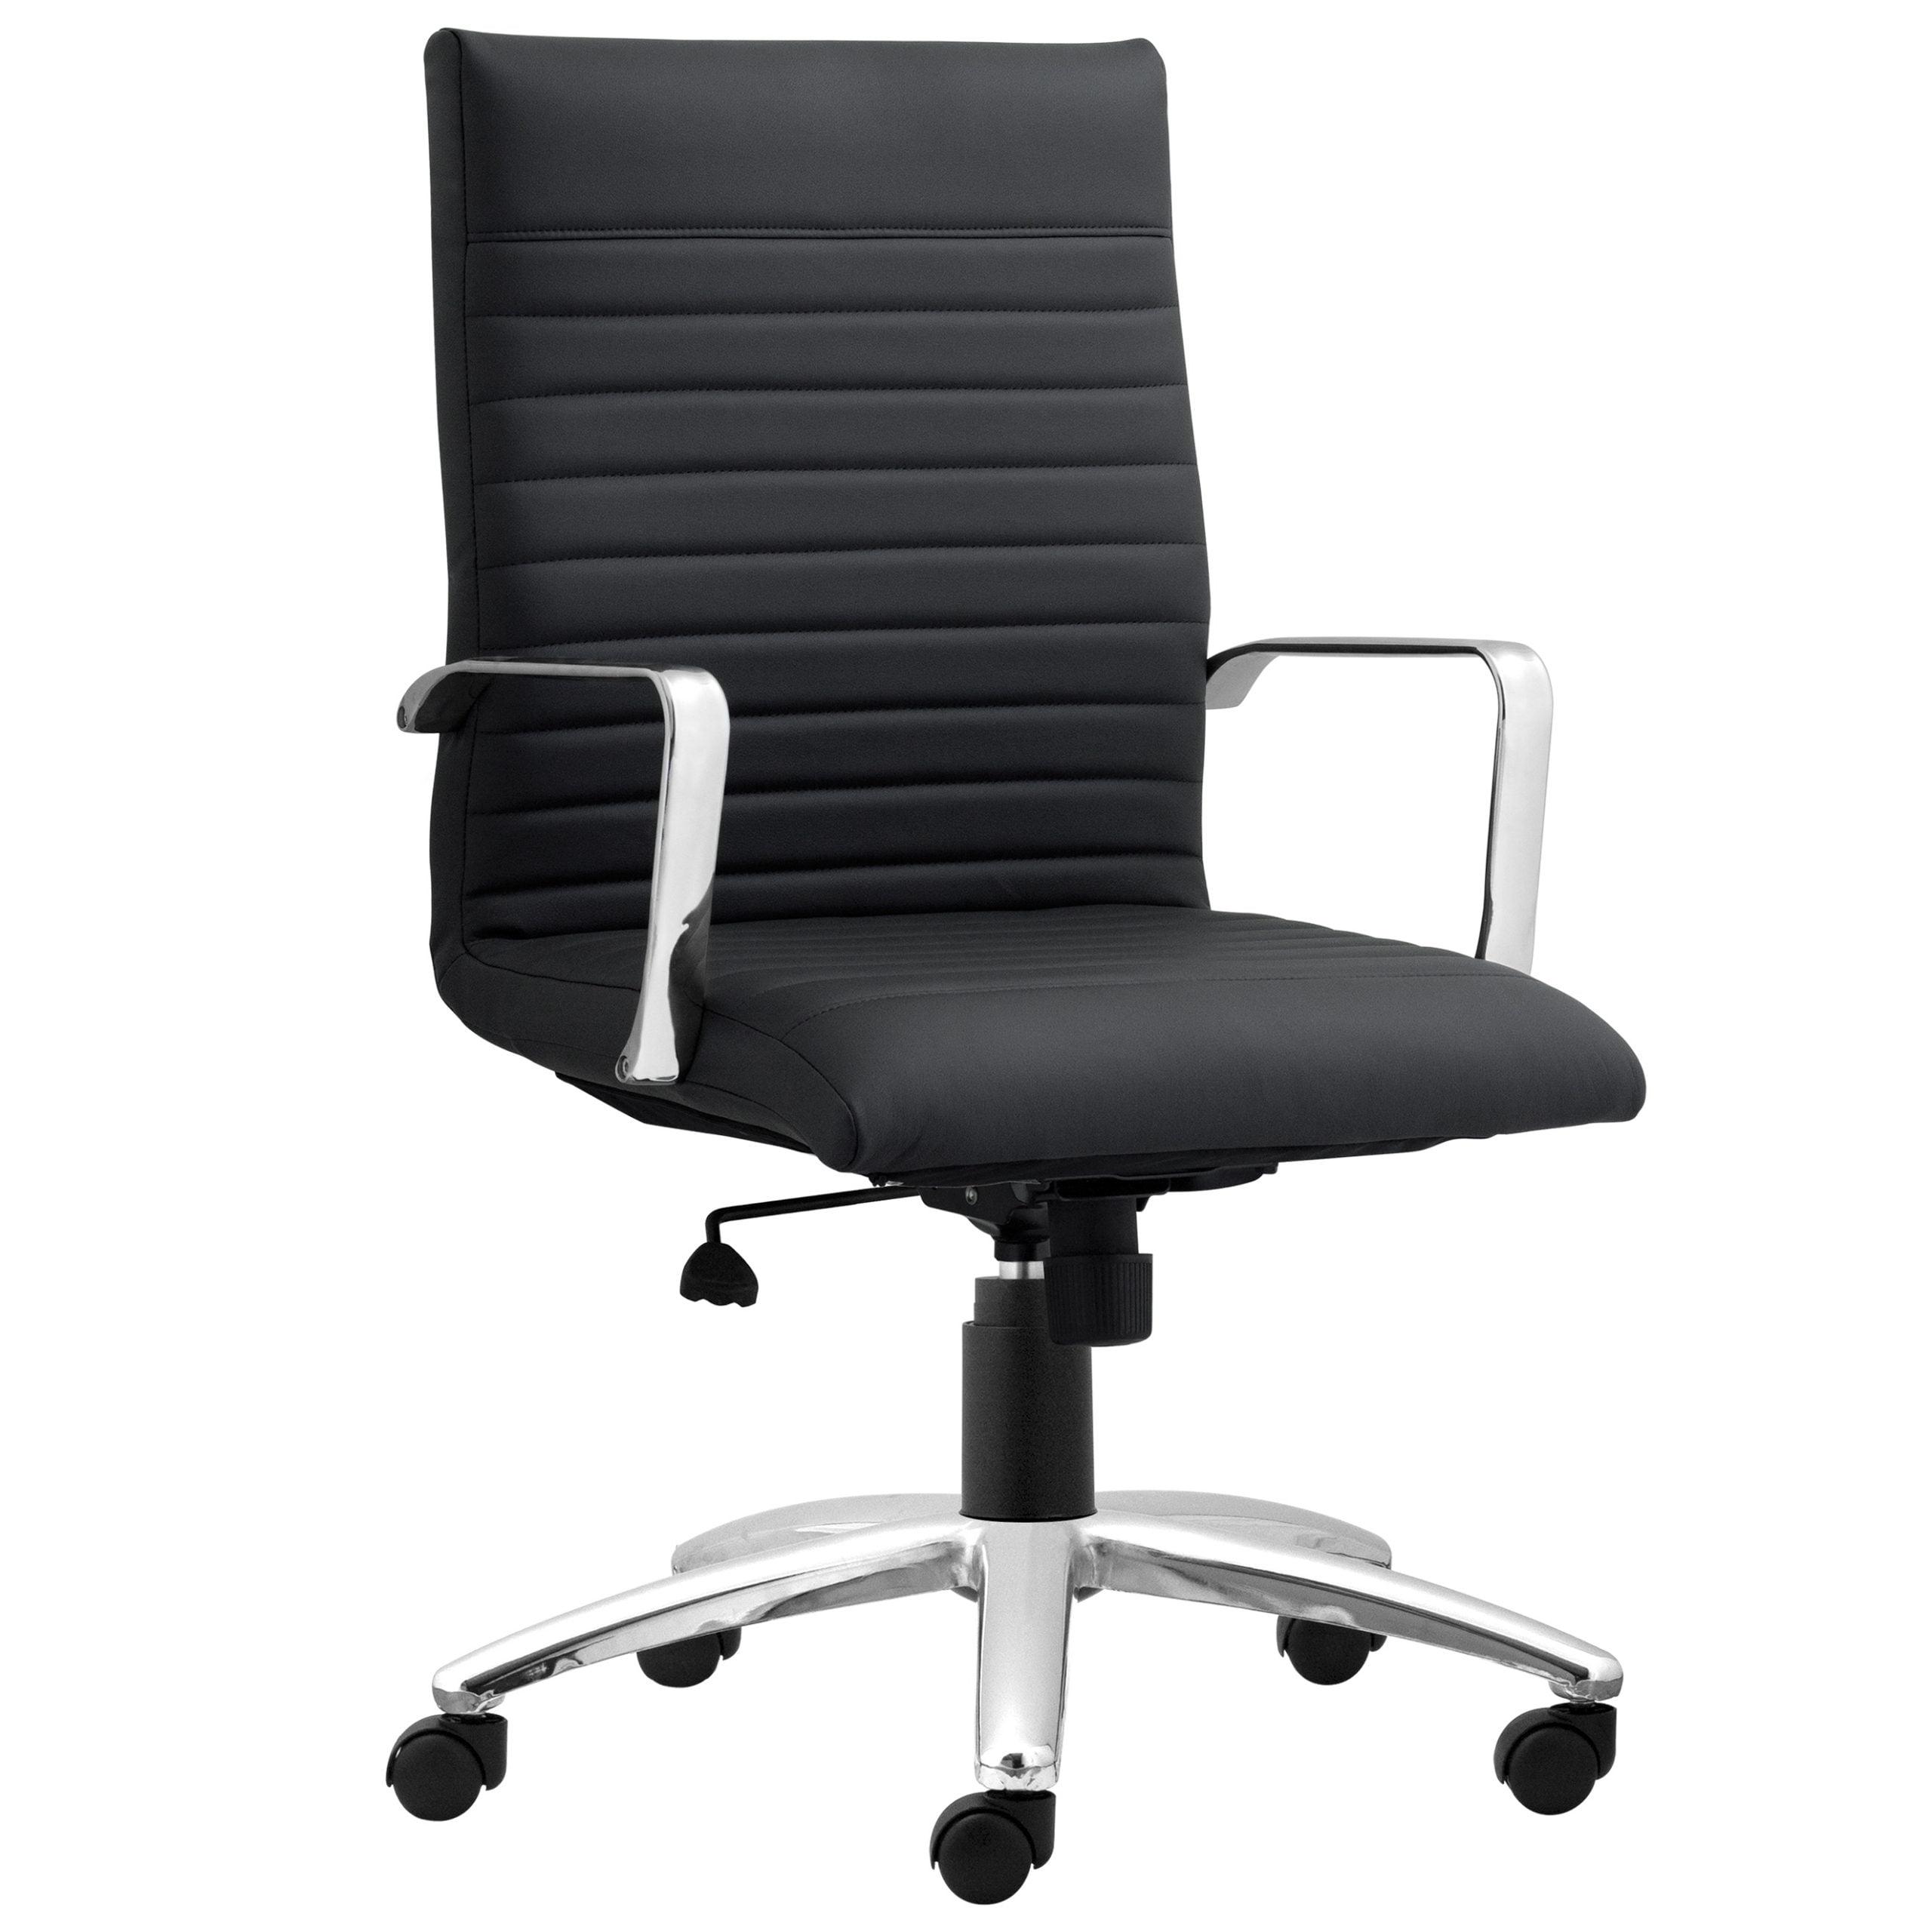 Modena Task Chair - Black